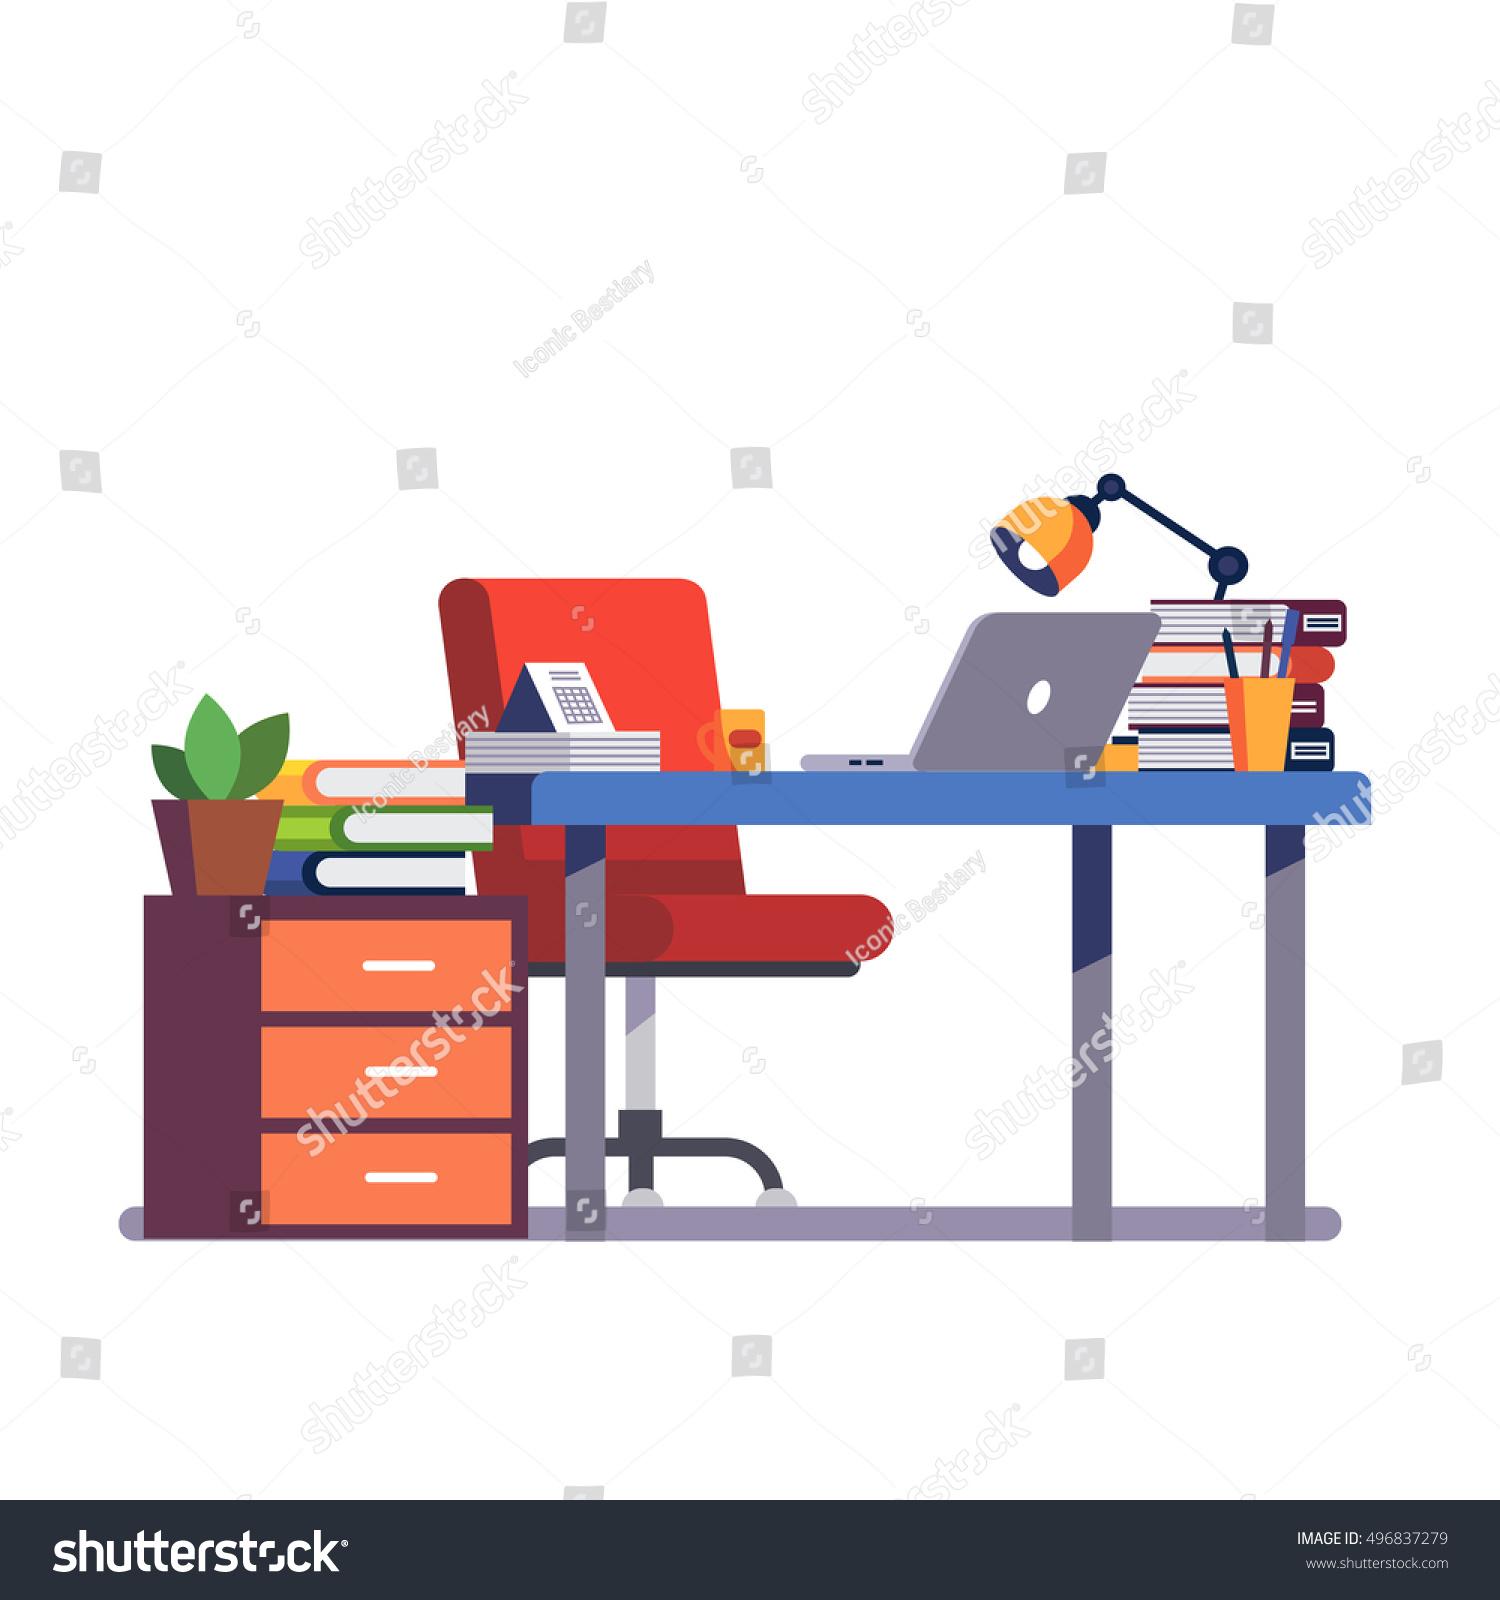 Office Desk Wallpaper: Home Office Desk Pedestal Drawer Casters Stock Vector